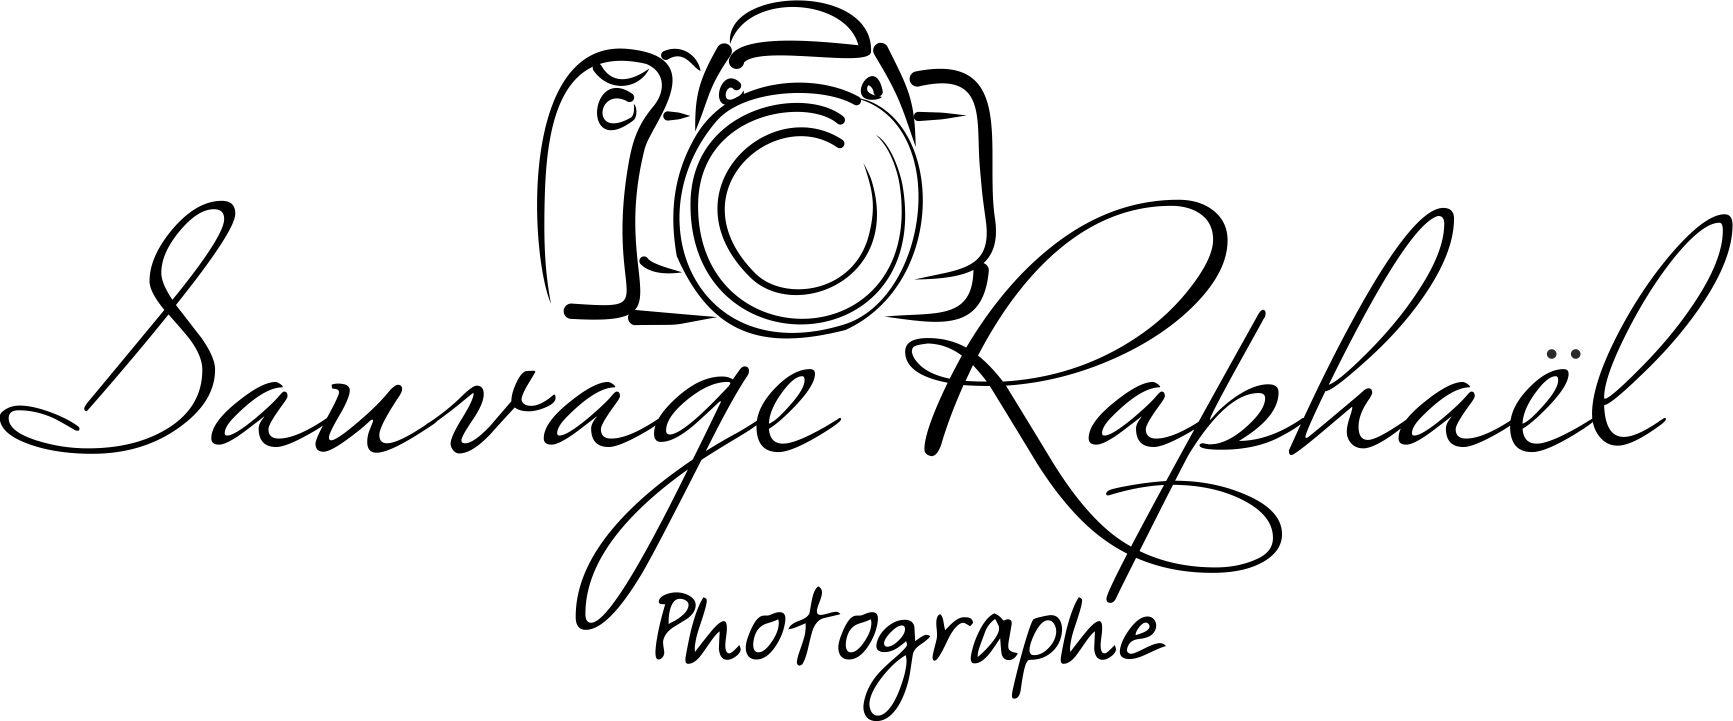 Photographe Sauvage Raphael - Photographe Strasbourg